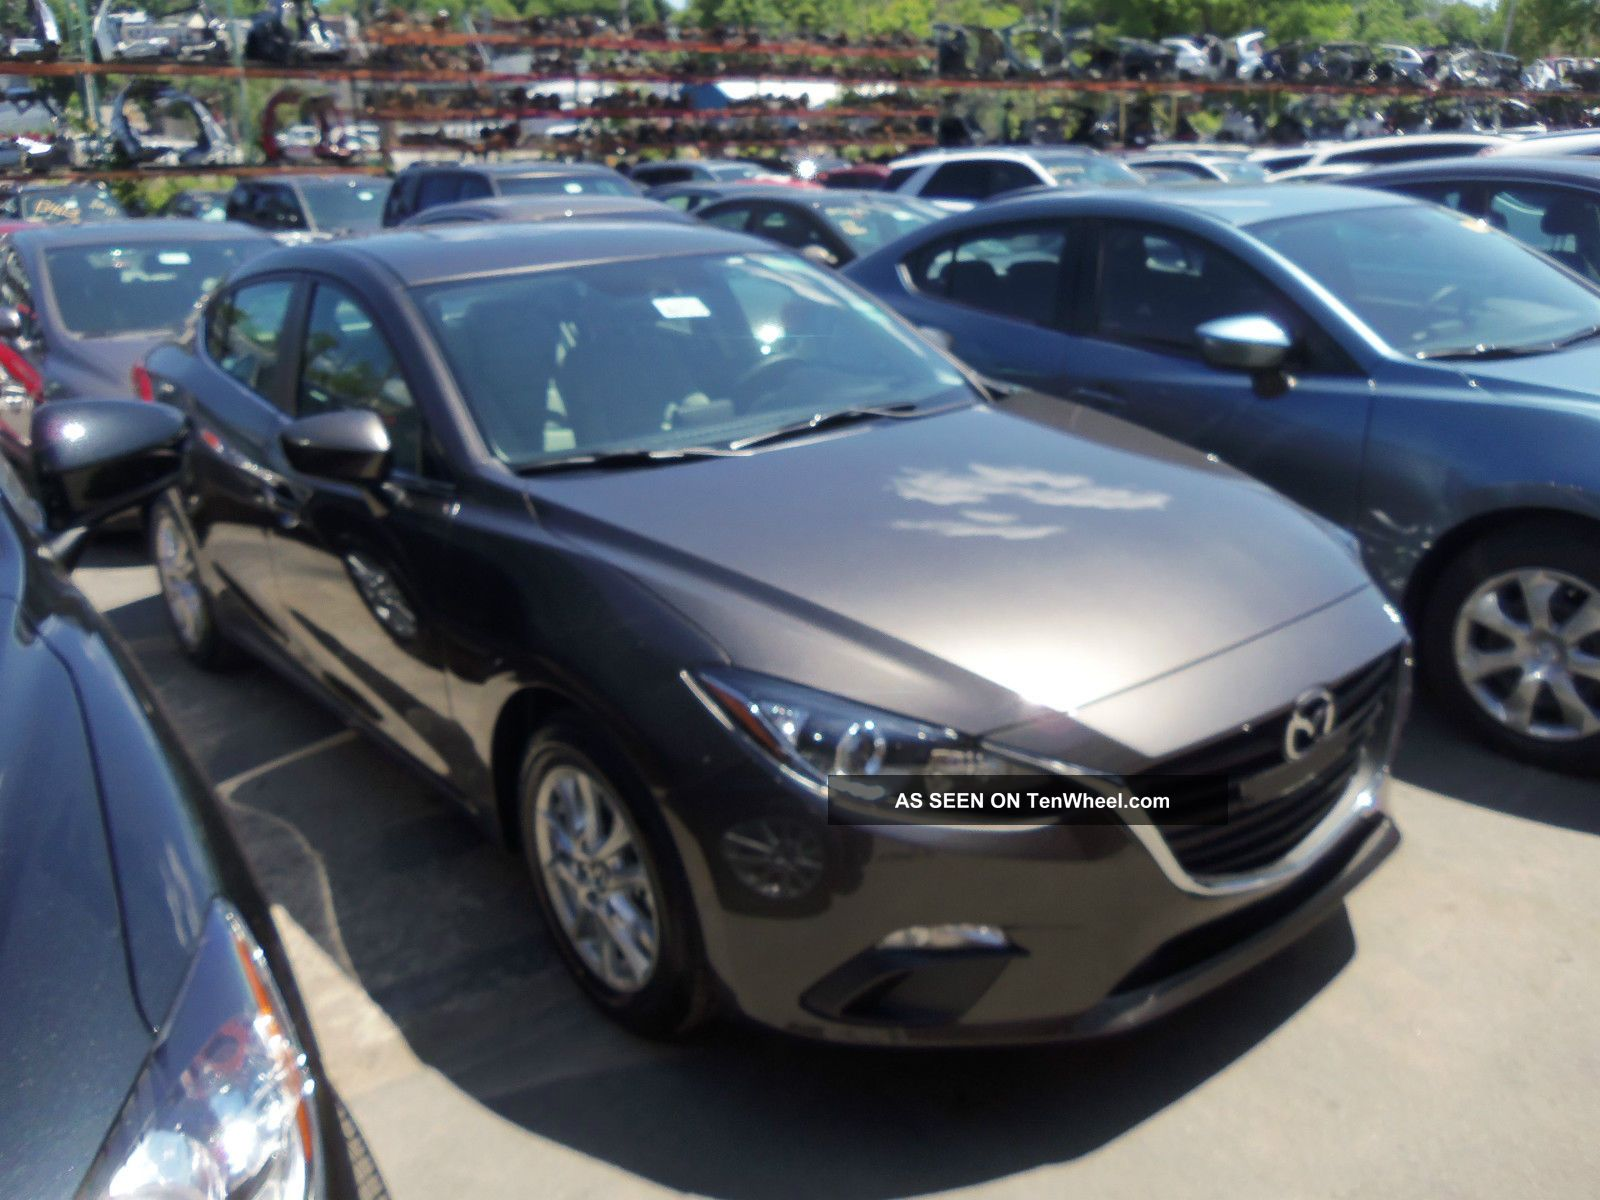 2014 Mazda 3i Touring Mazda3 photo